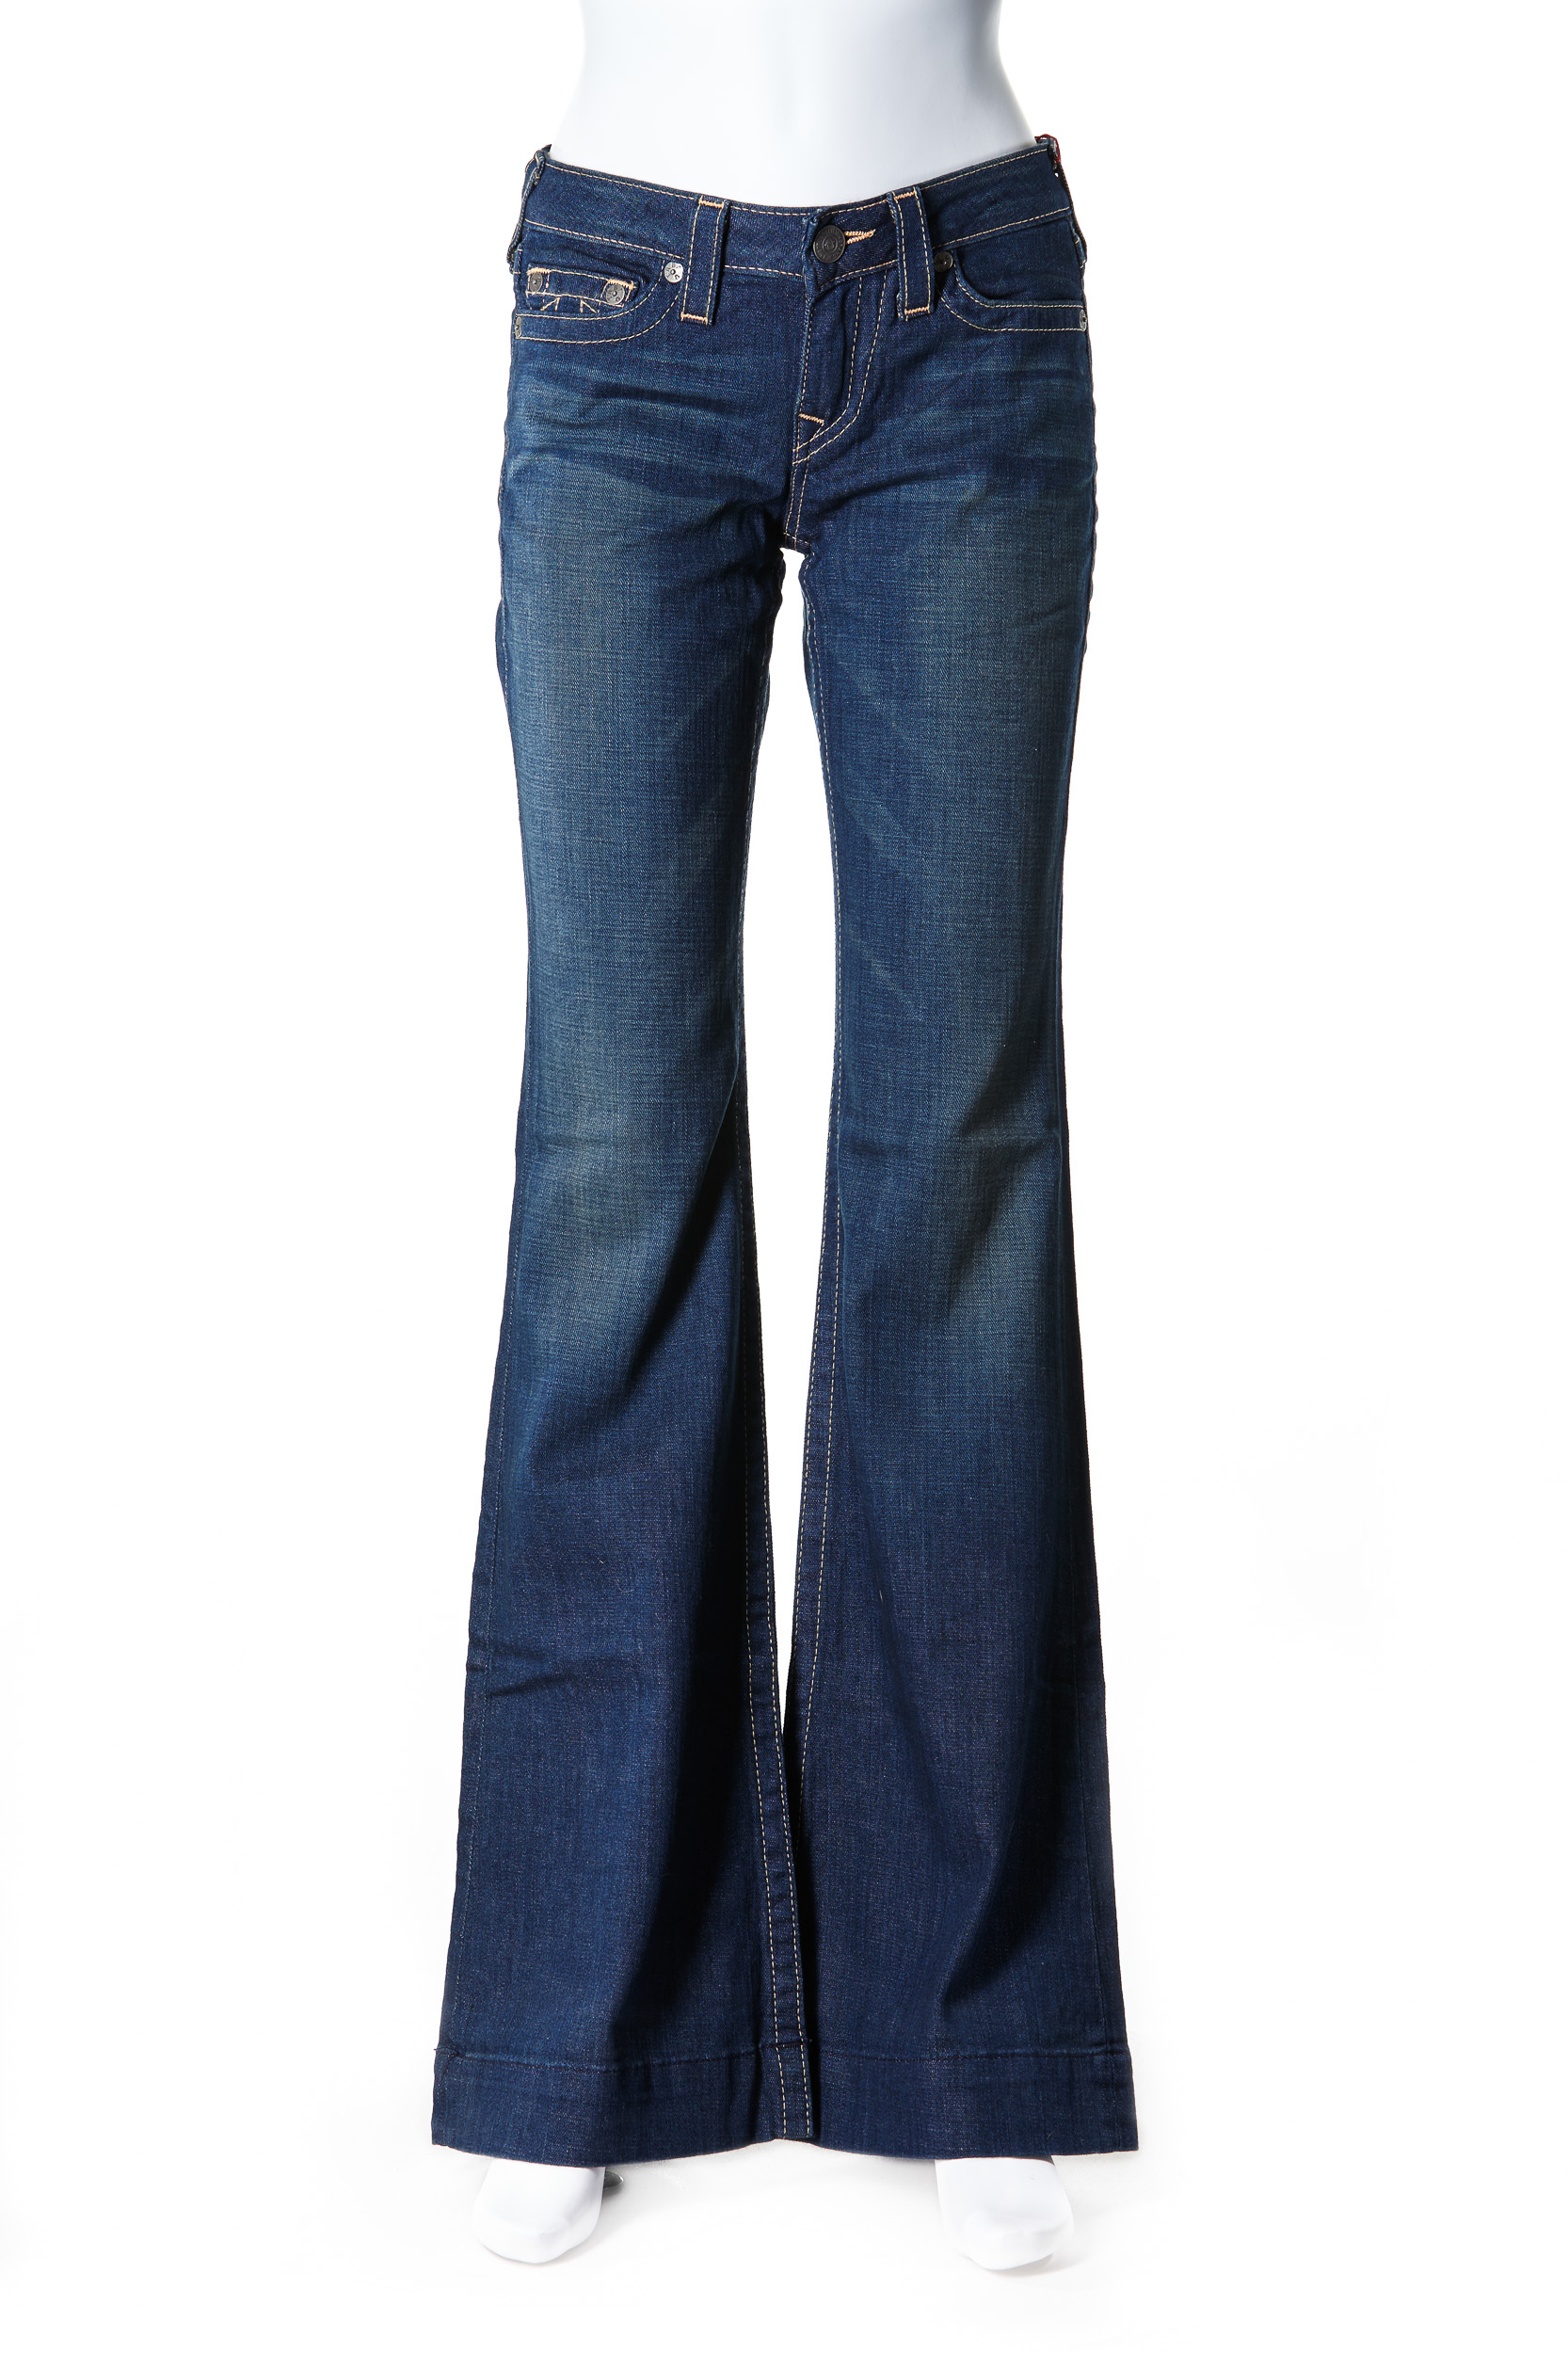 TRUE RELIGION DANA BUGSY 系列 新潮喇叭牛仔褲 美國製造 現貨供應【美國好褲】